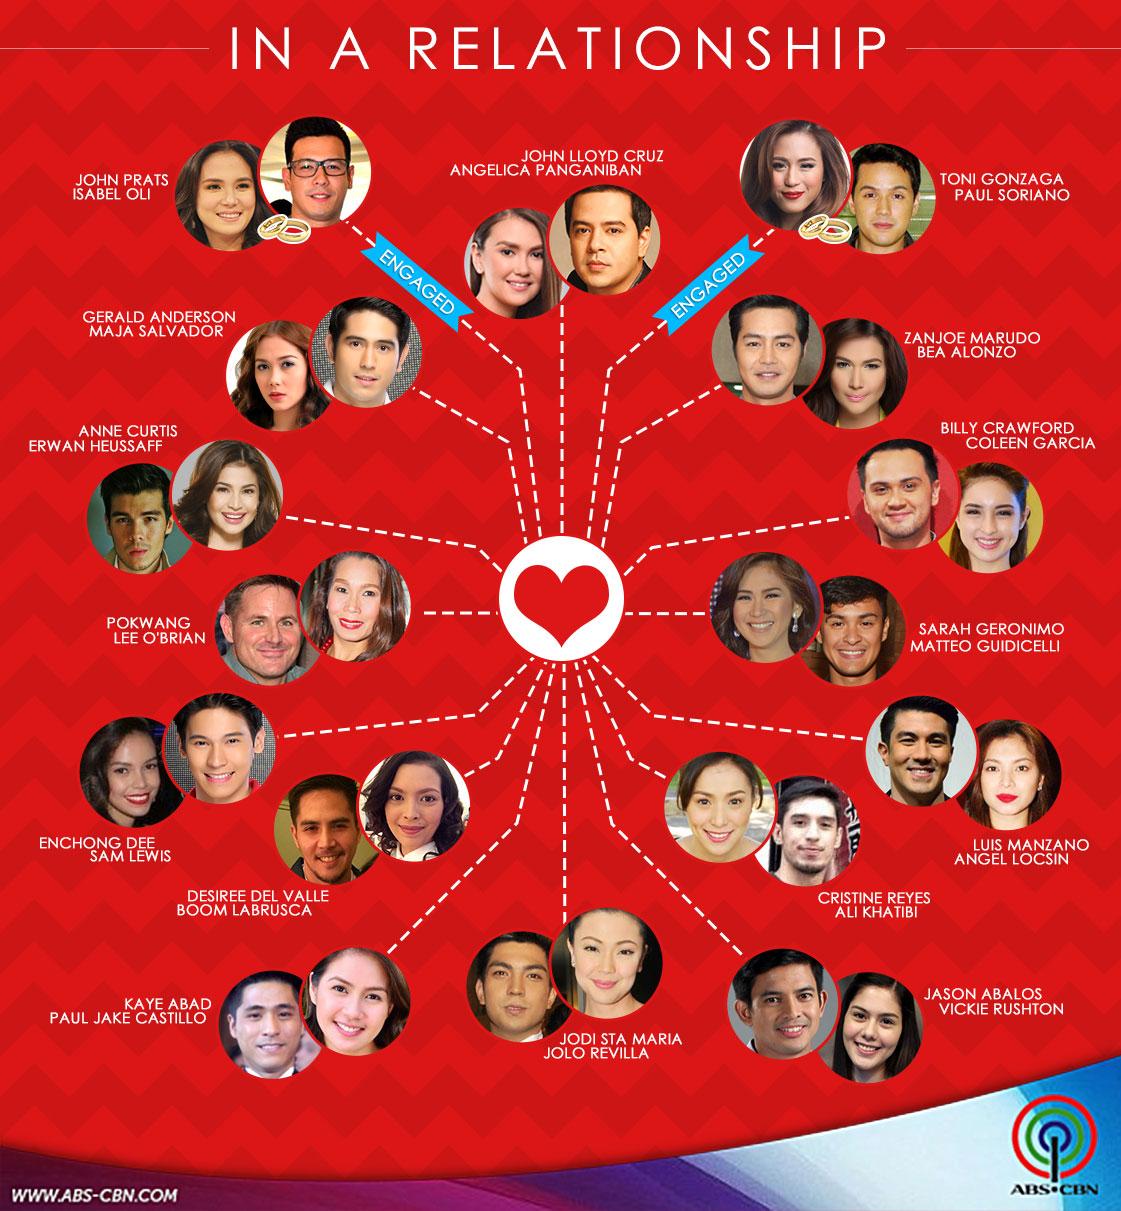 HEARTS BY THE TREE: Love, Love, Love mula sa kinikikiligan nating celebrity couples